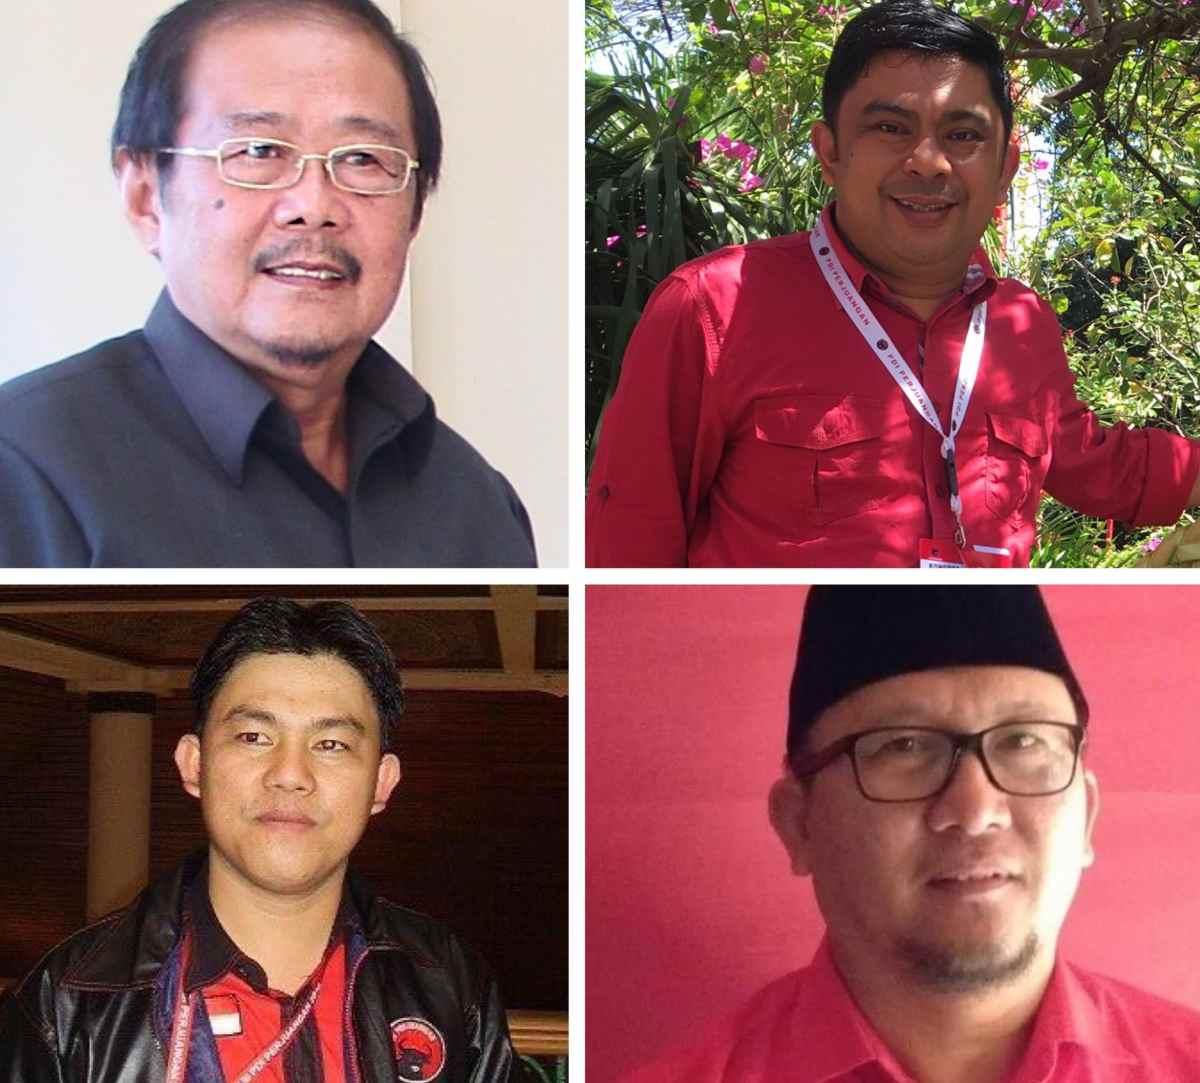 Empat Kader PDI Perjuangan Ini Calon Ketua DPRD di BMR Berita Politik